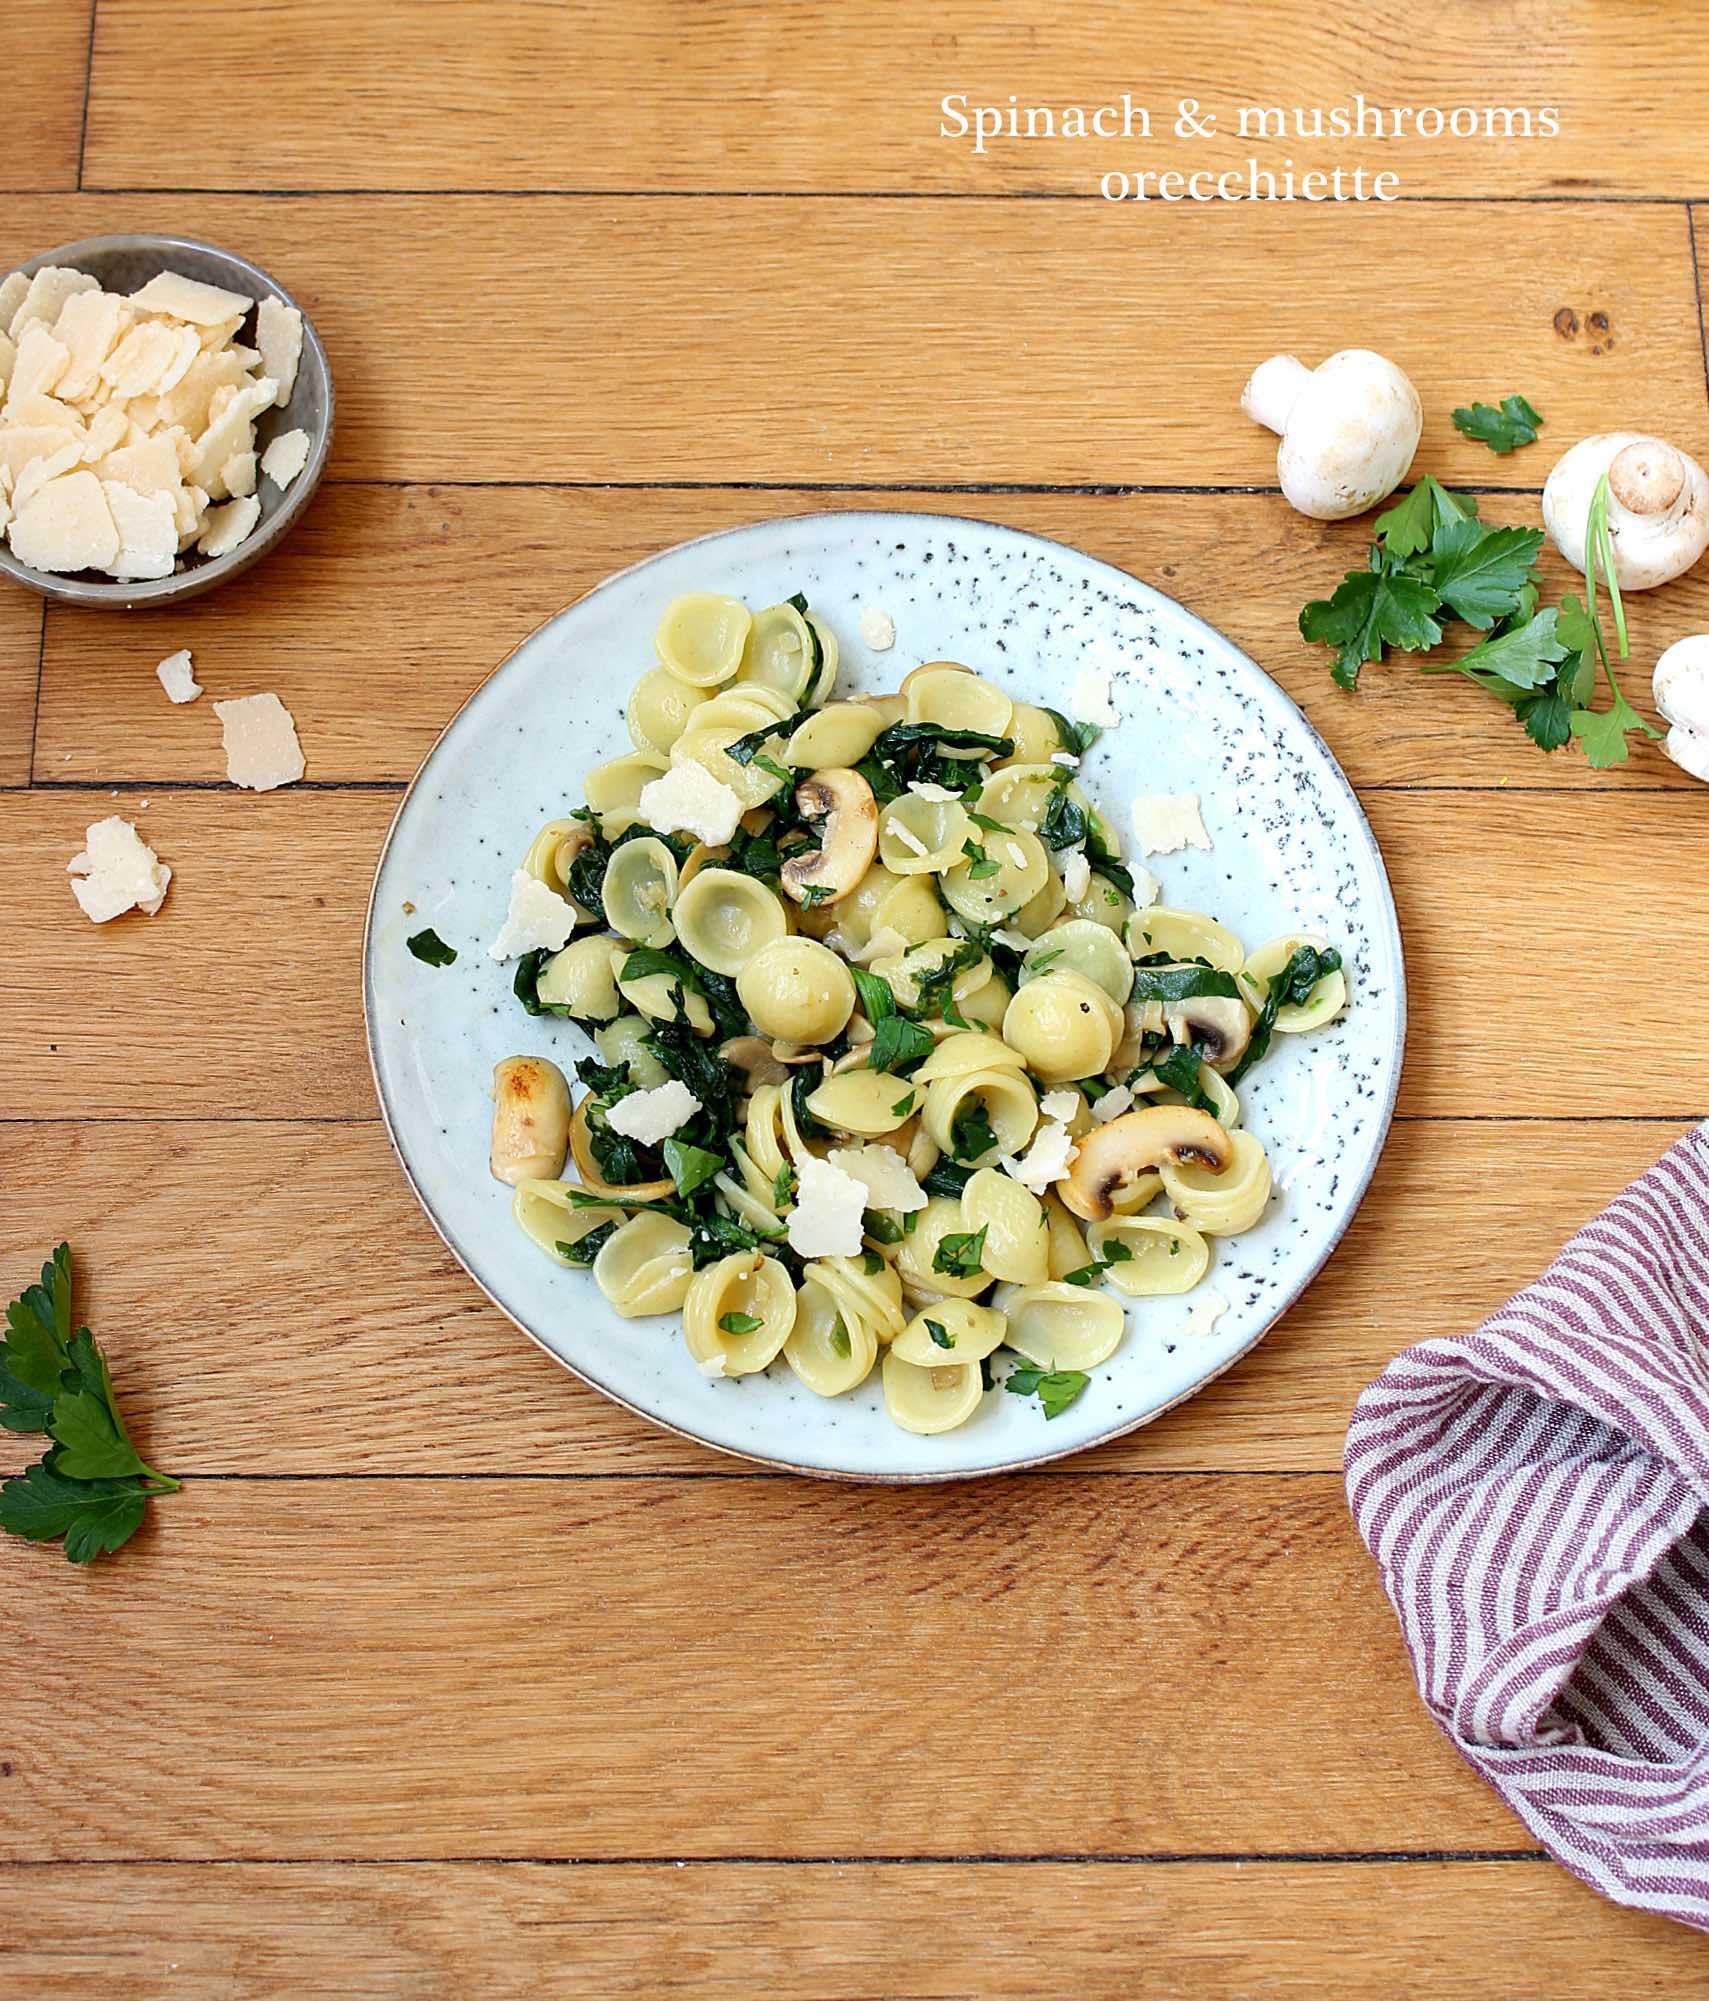 Mushroom & spinach orecchiette